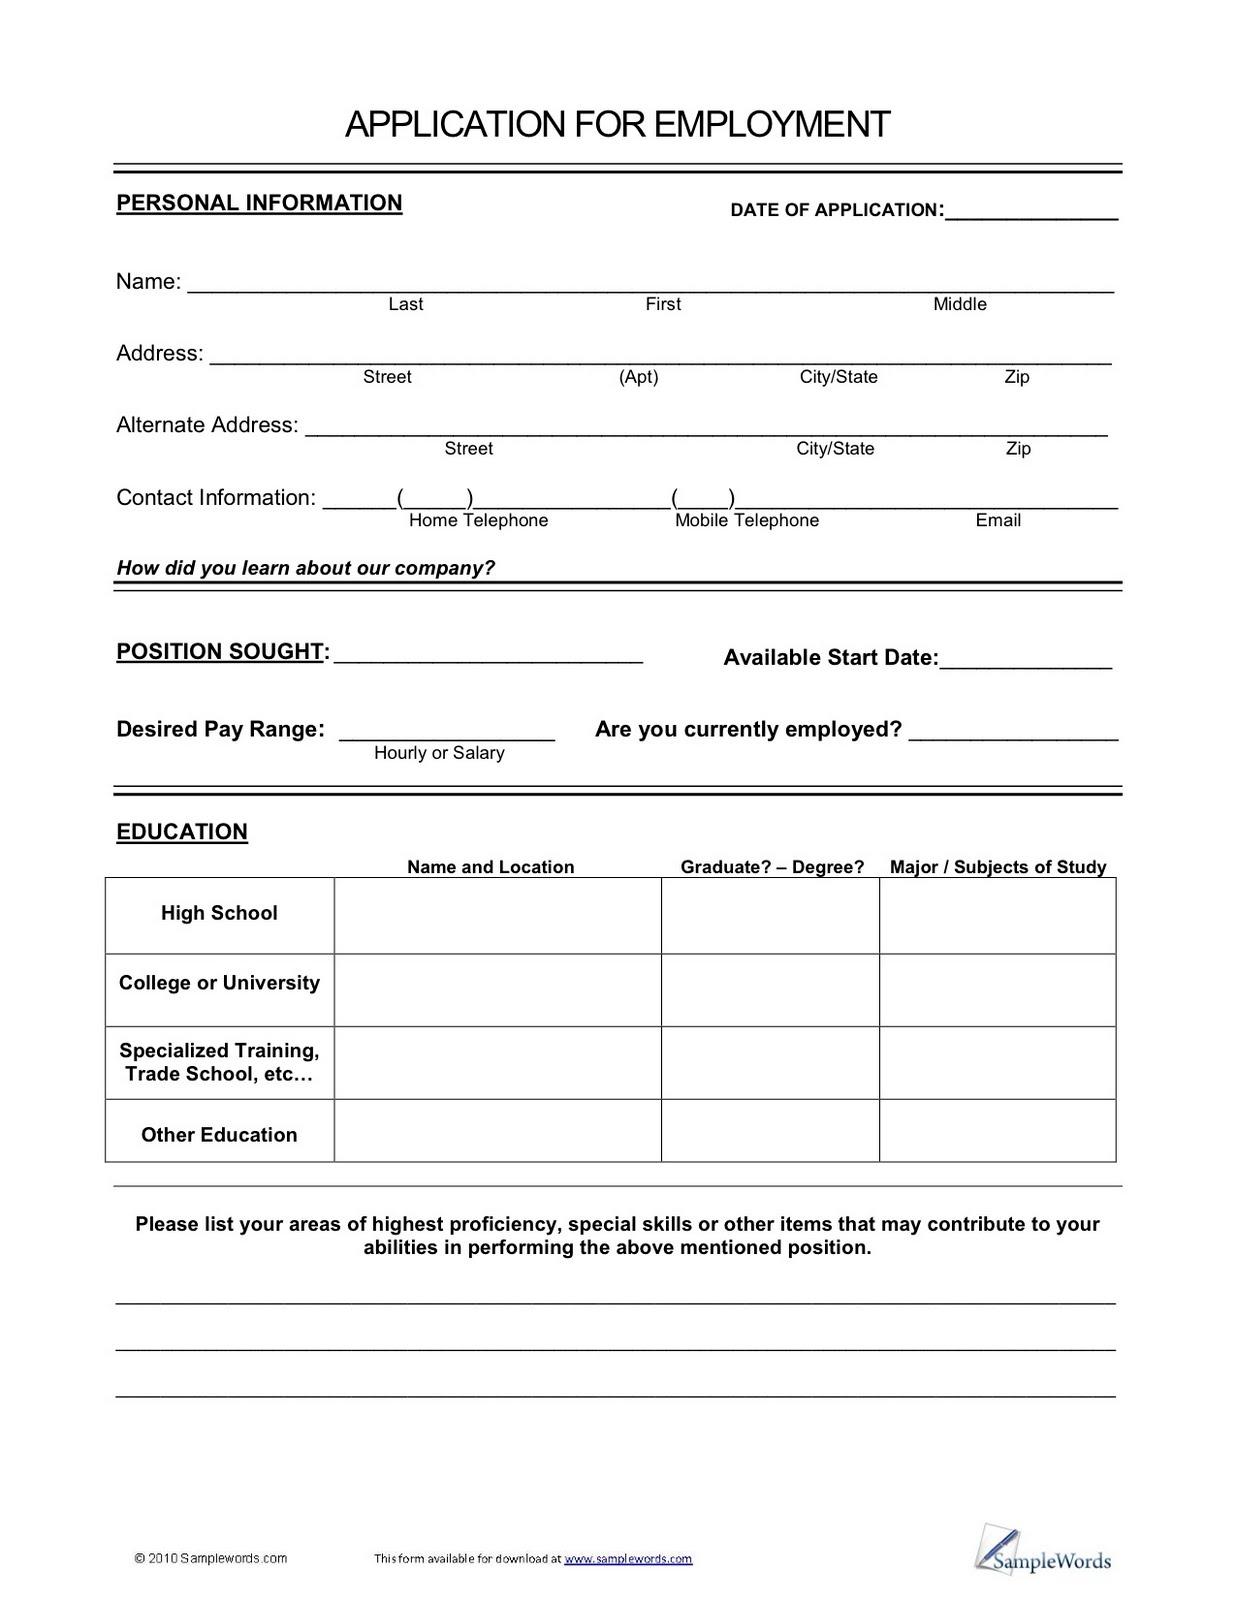 Vons job application form | Daily cash Job